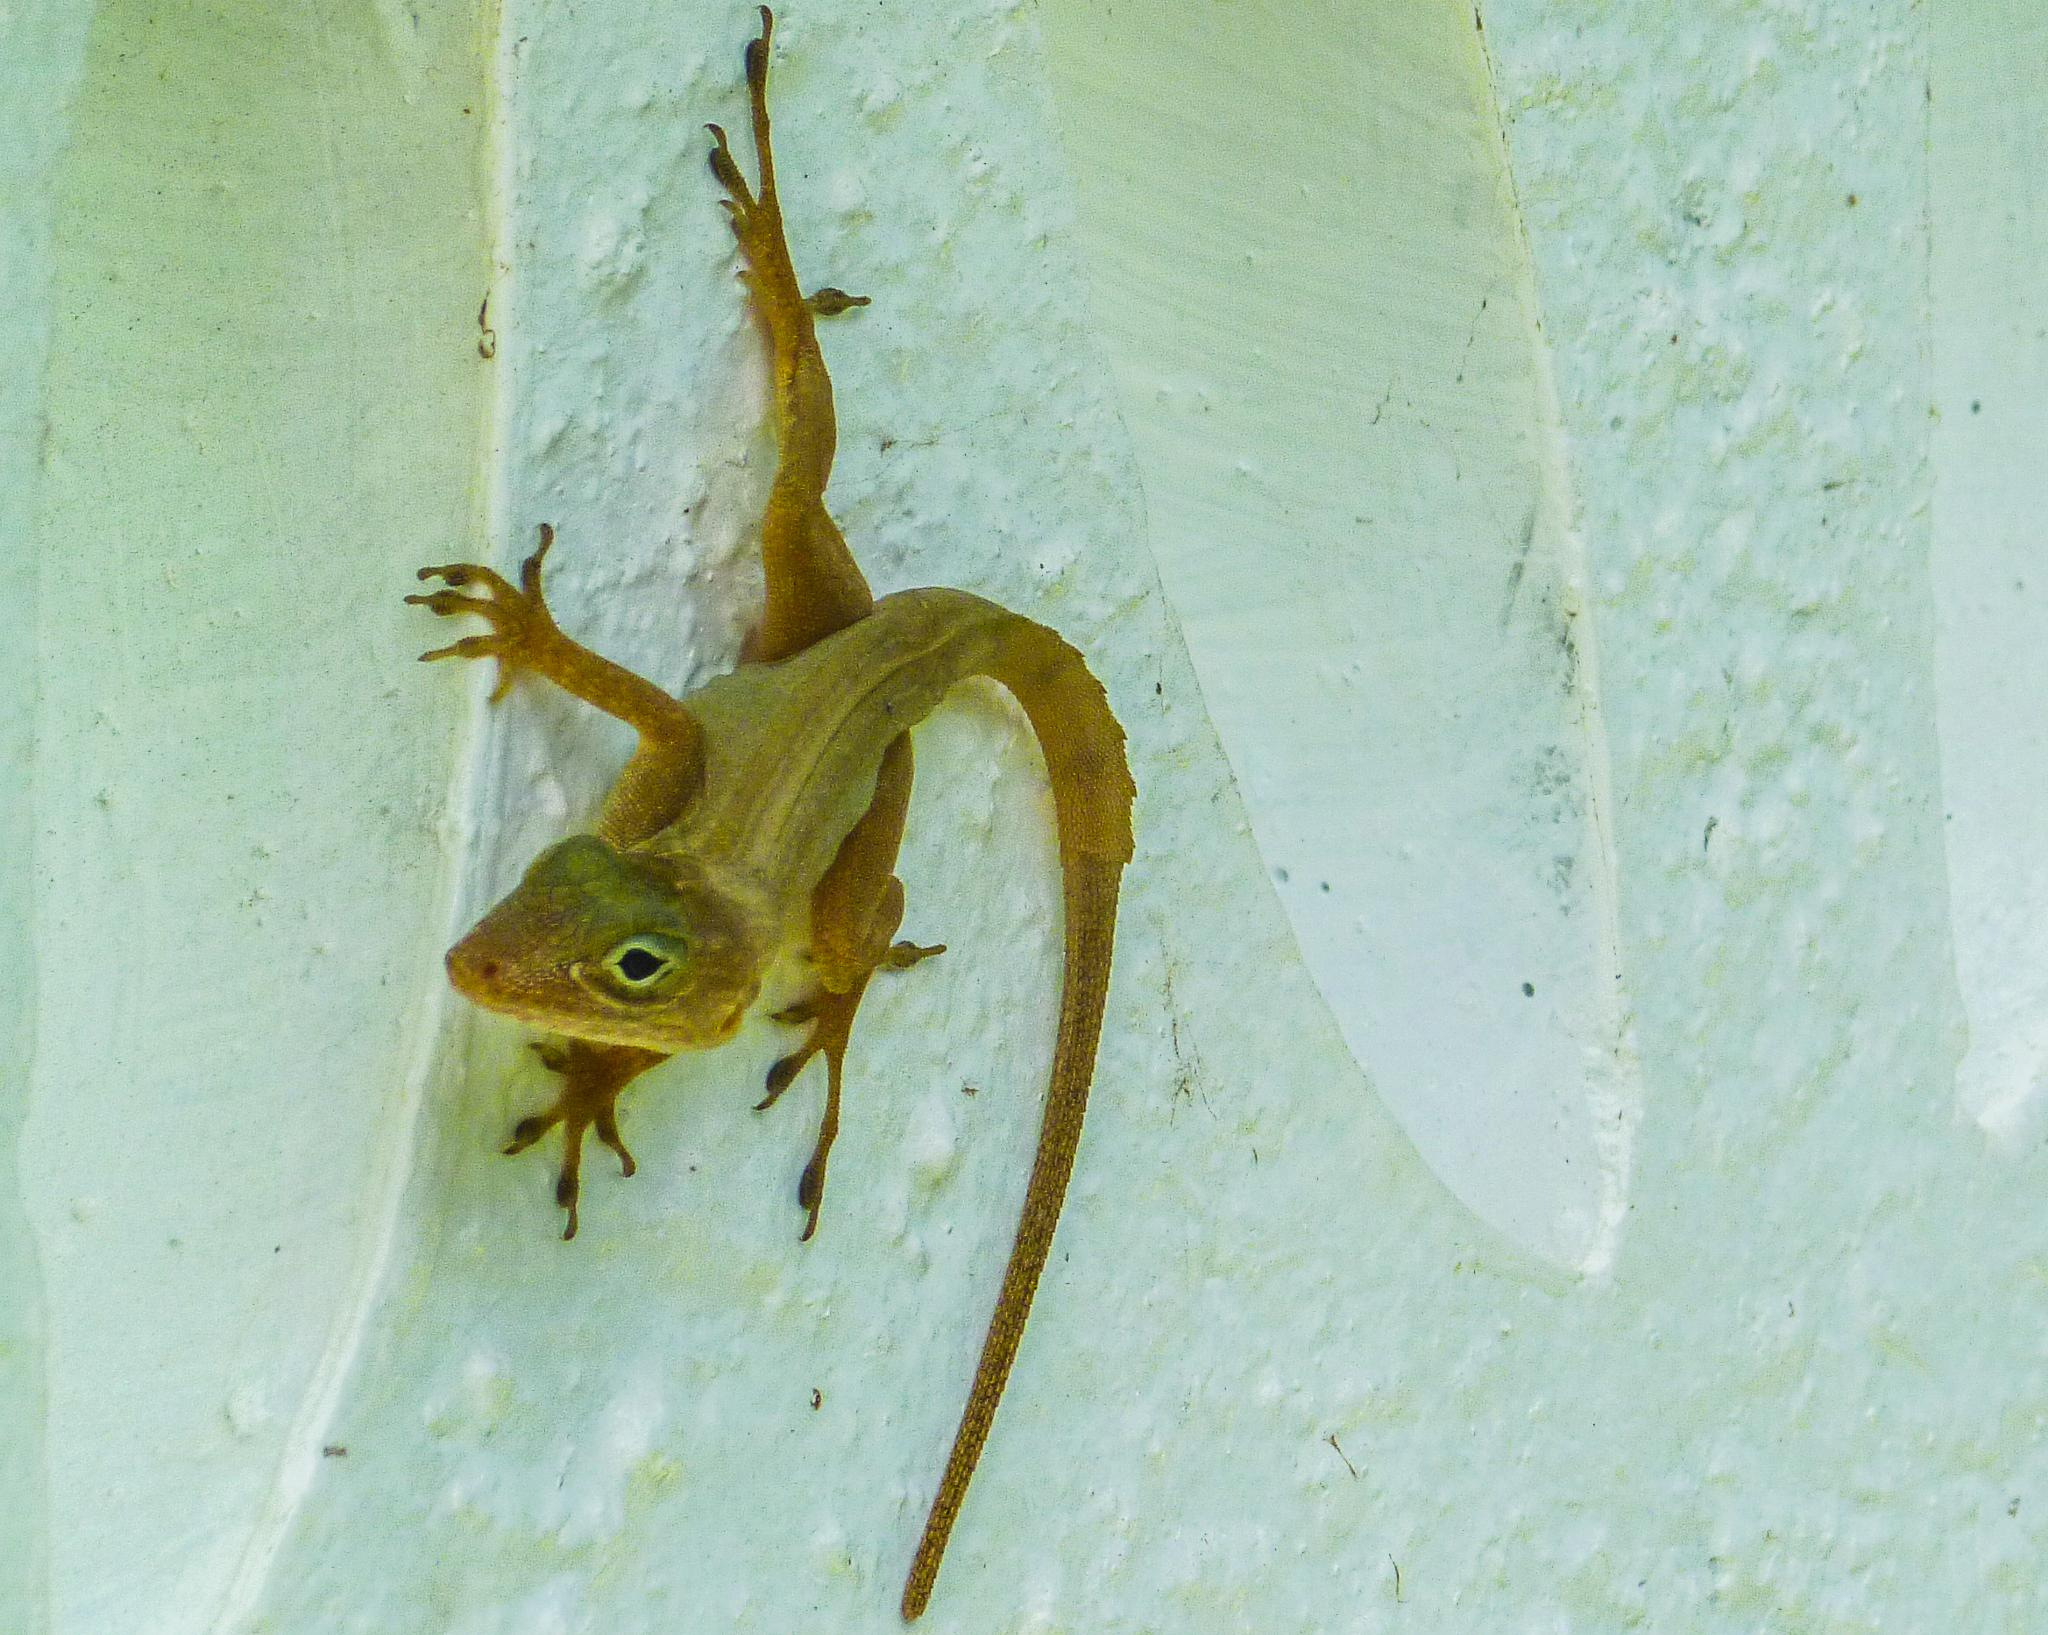 Mr. Lizard by Cait Templeton